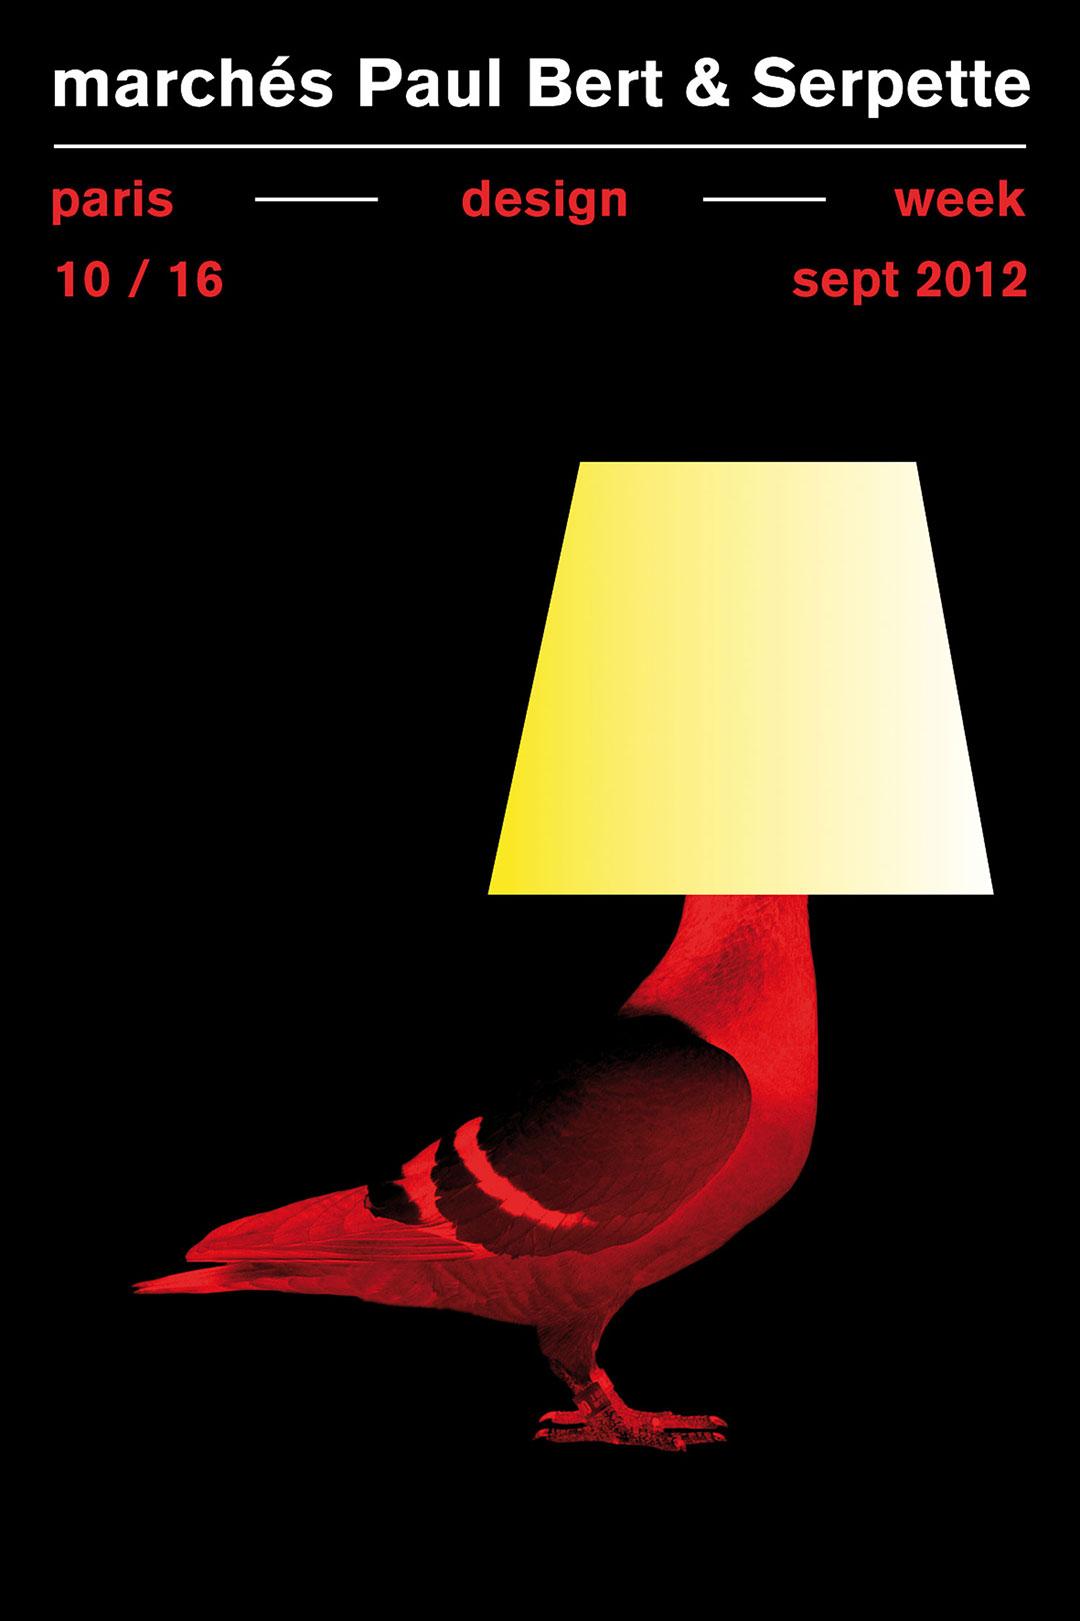 « Paris design week »<br />affiche (80 x 120 cm), 2012